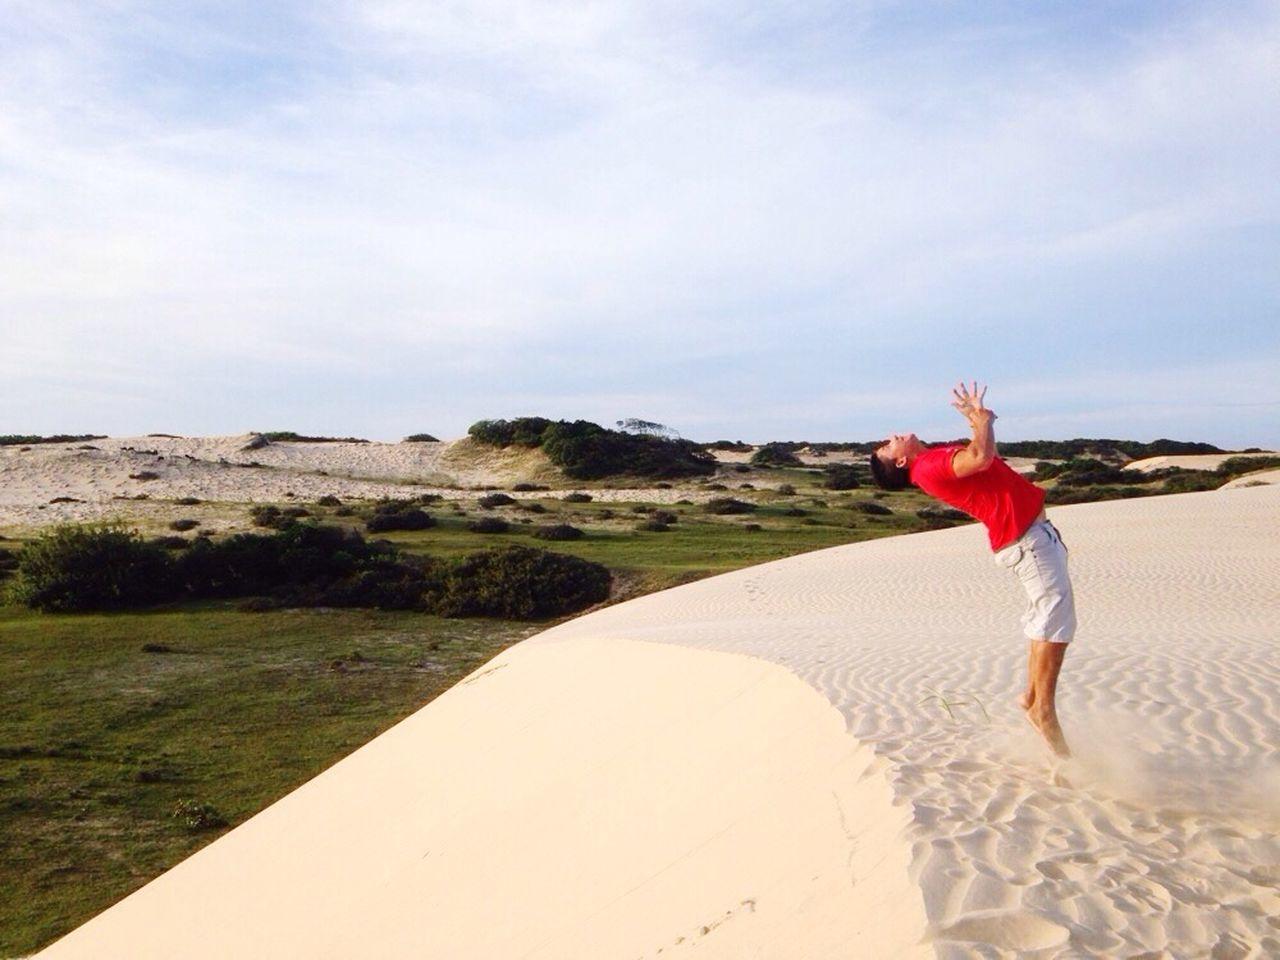 Dando salto mortal na duna.